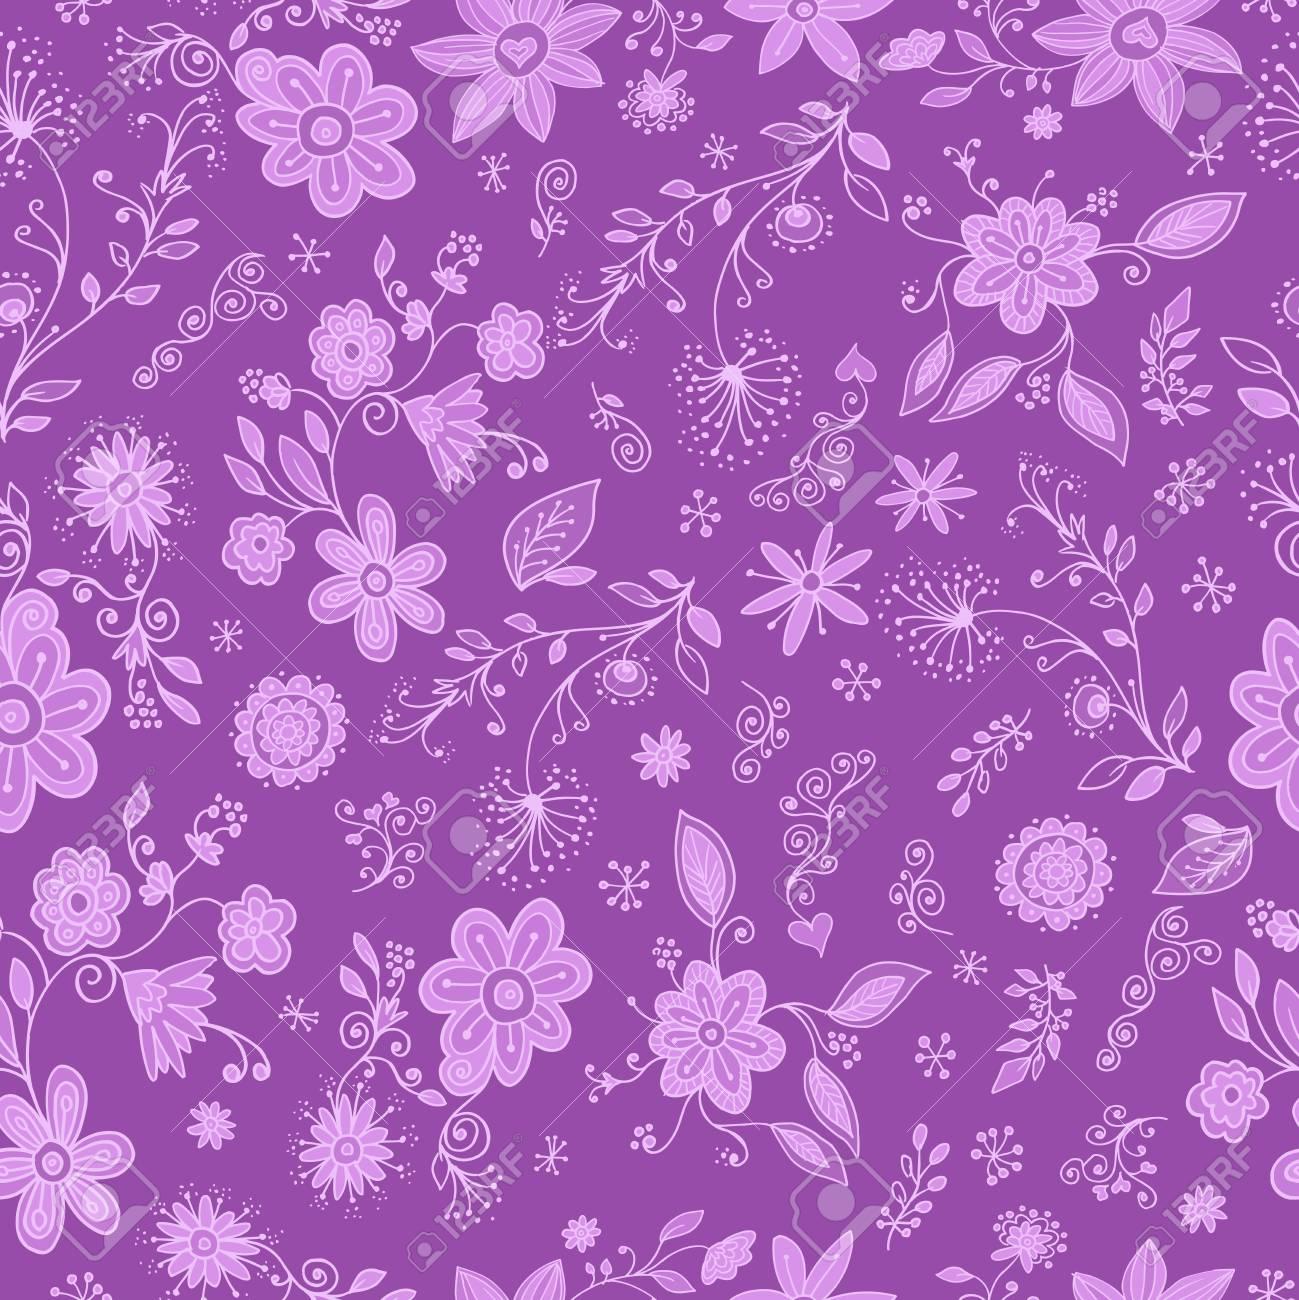 Springtime Flower Seamless Pattern Stock Vector - 17223385